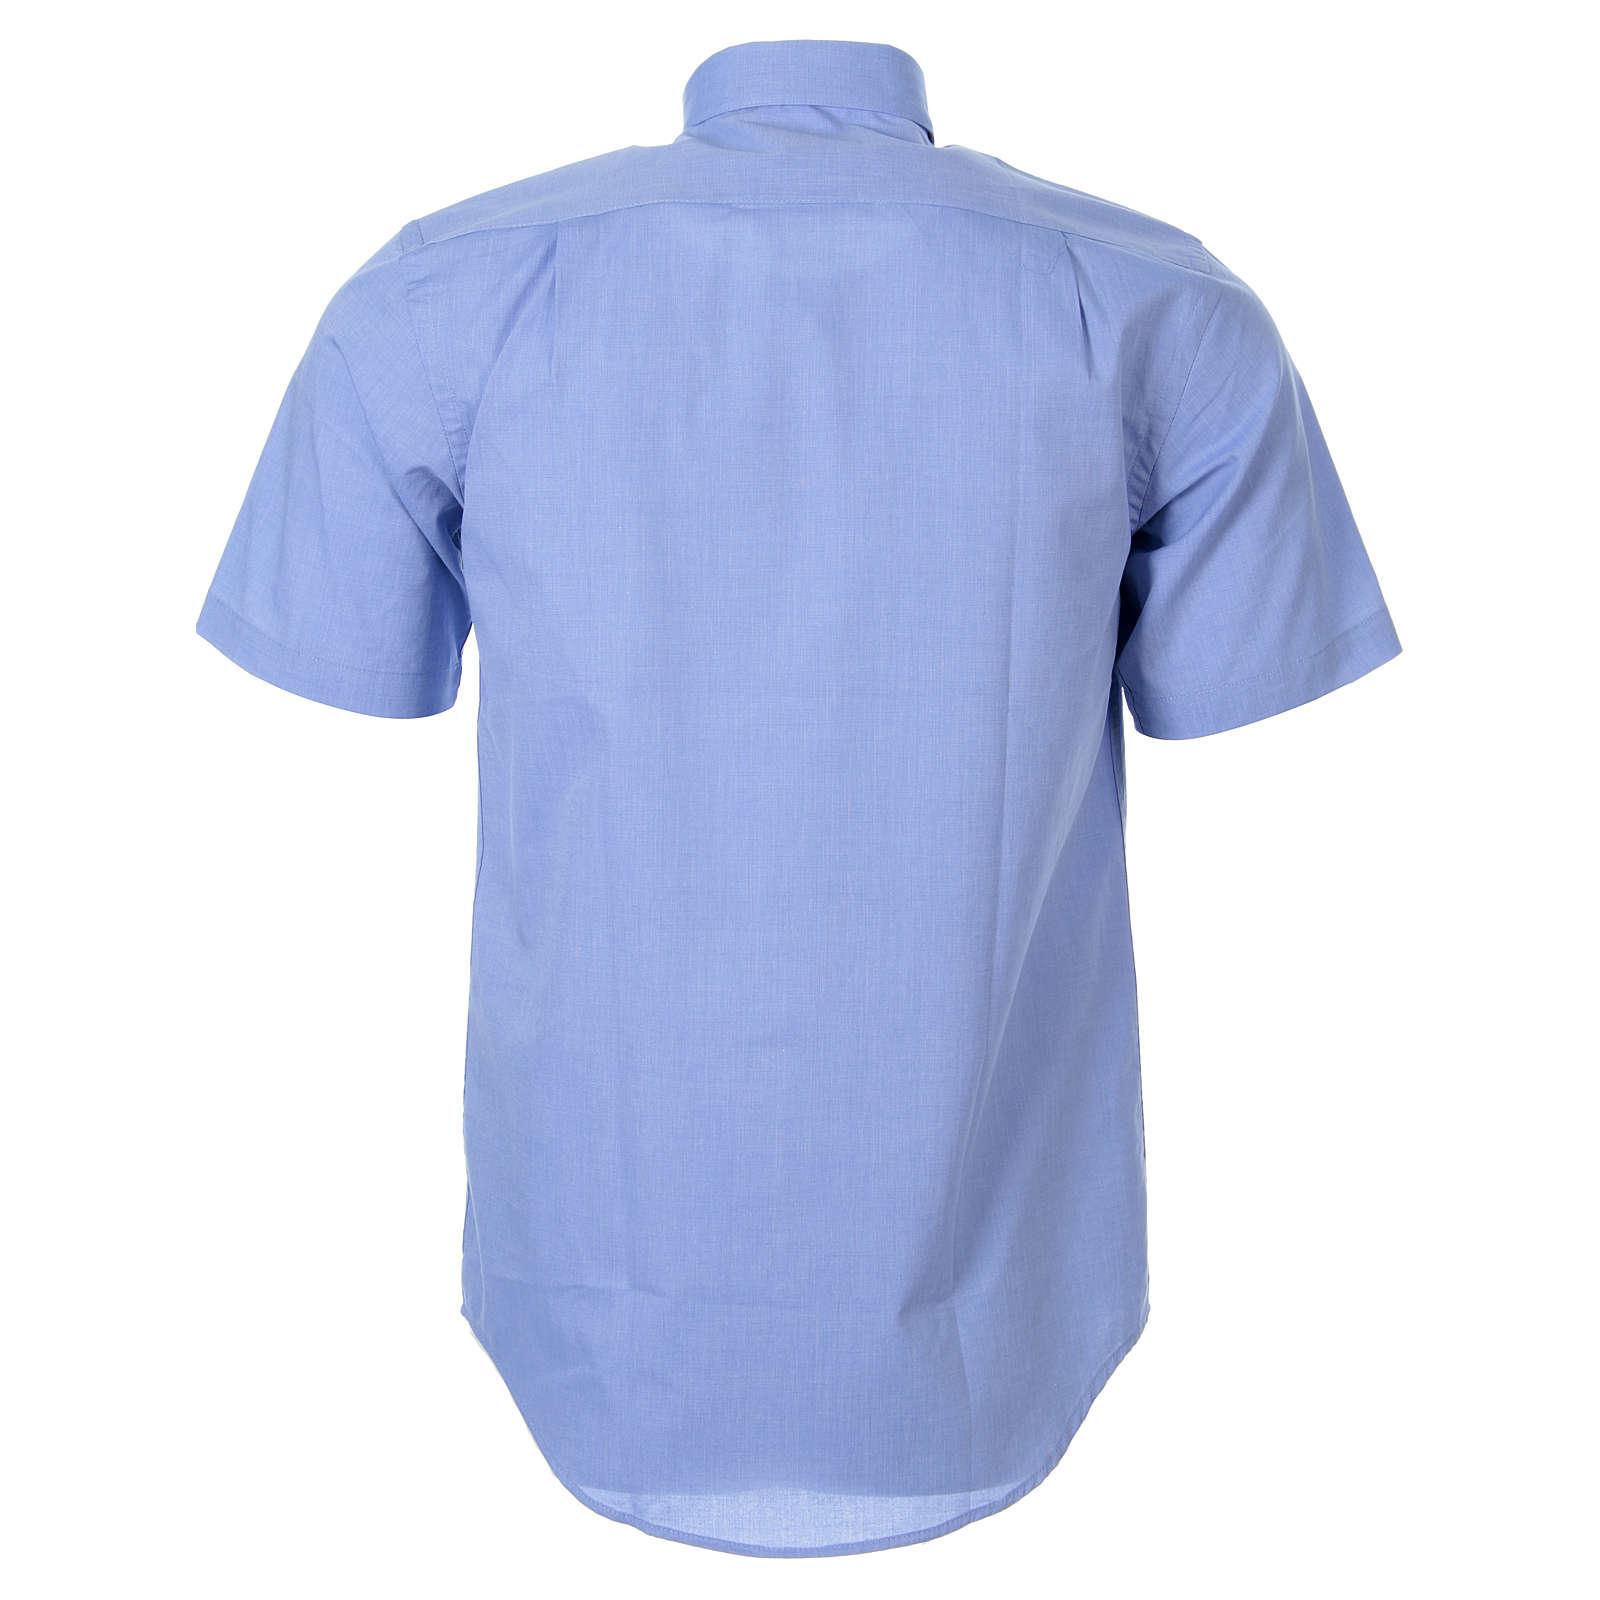 STOCK Camisa clergyman manga corta filafil azul claro 4